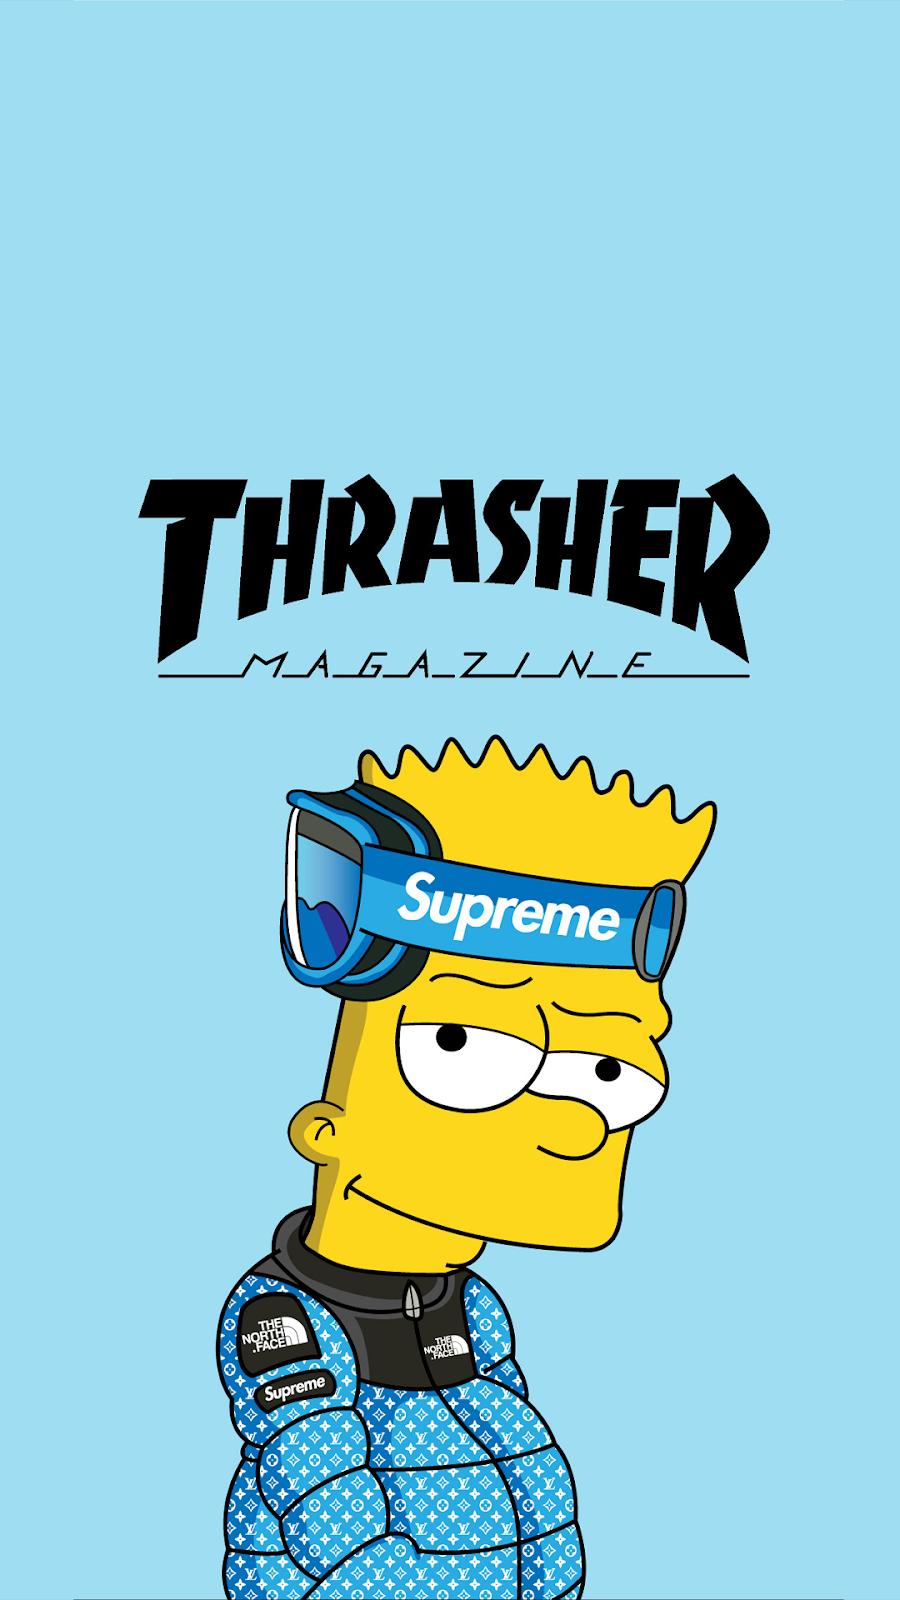 Supreme Wallpaper Bart Simpsons Supreme Wallpaper Bart Simpsons Supreme Wallpaper Simpson Wallpaper Iphone Bart Simpson